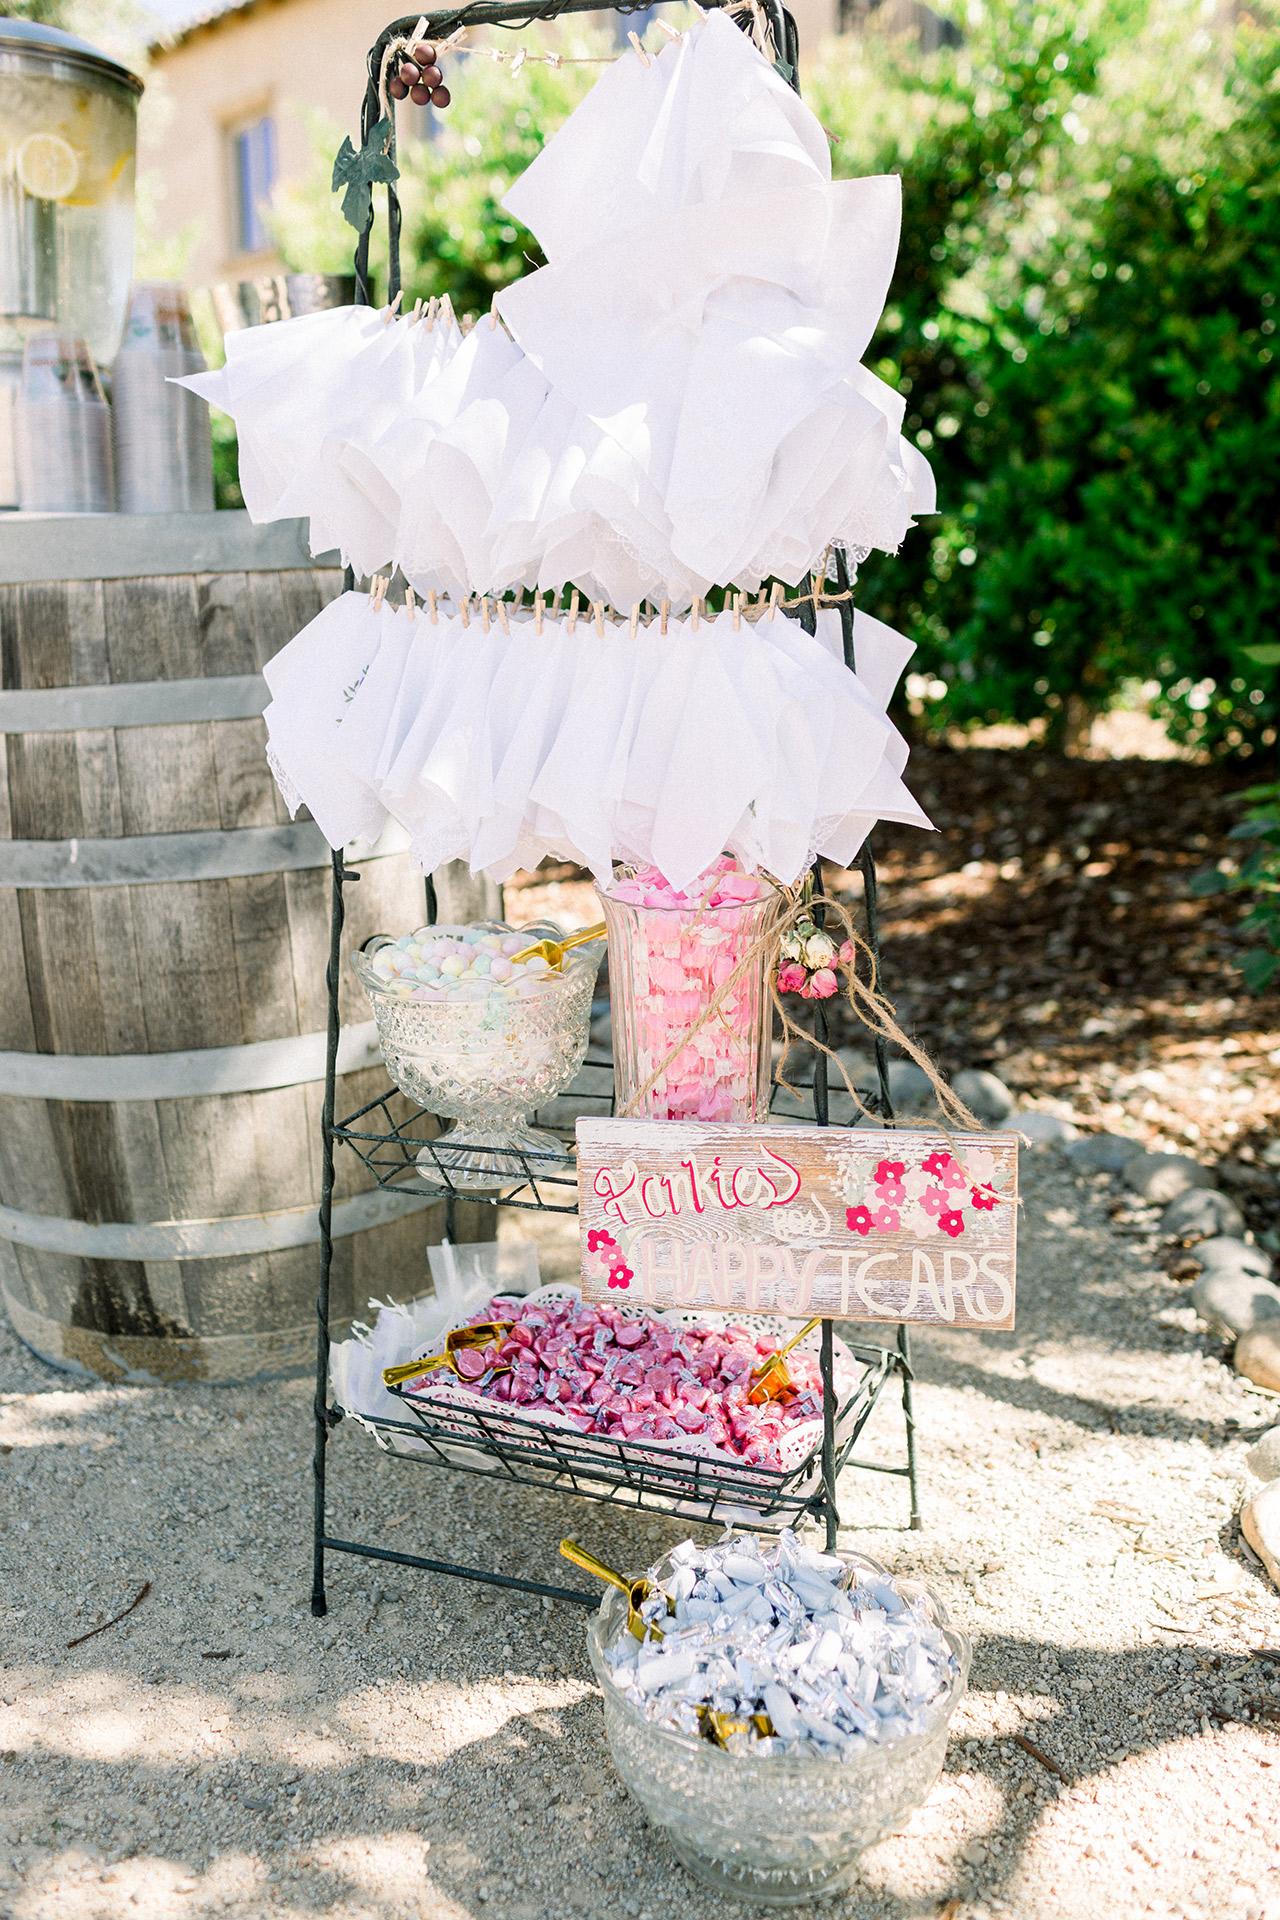 DIY handkerchief candy display outdoors